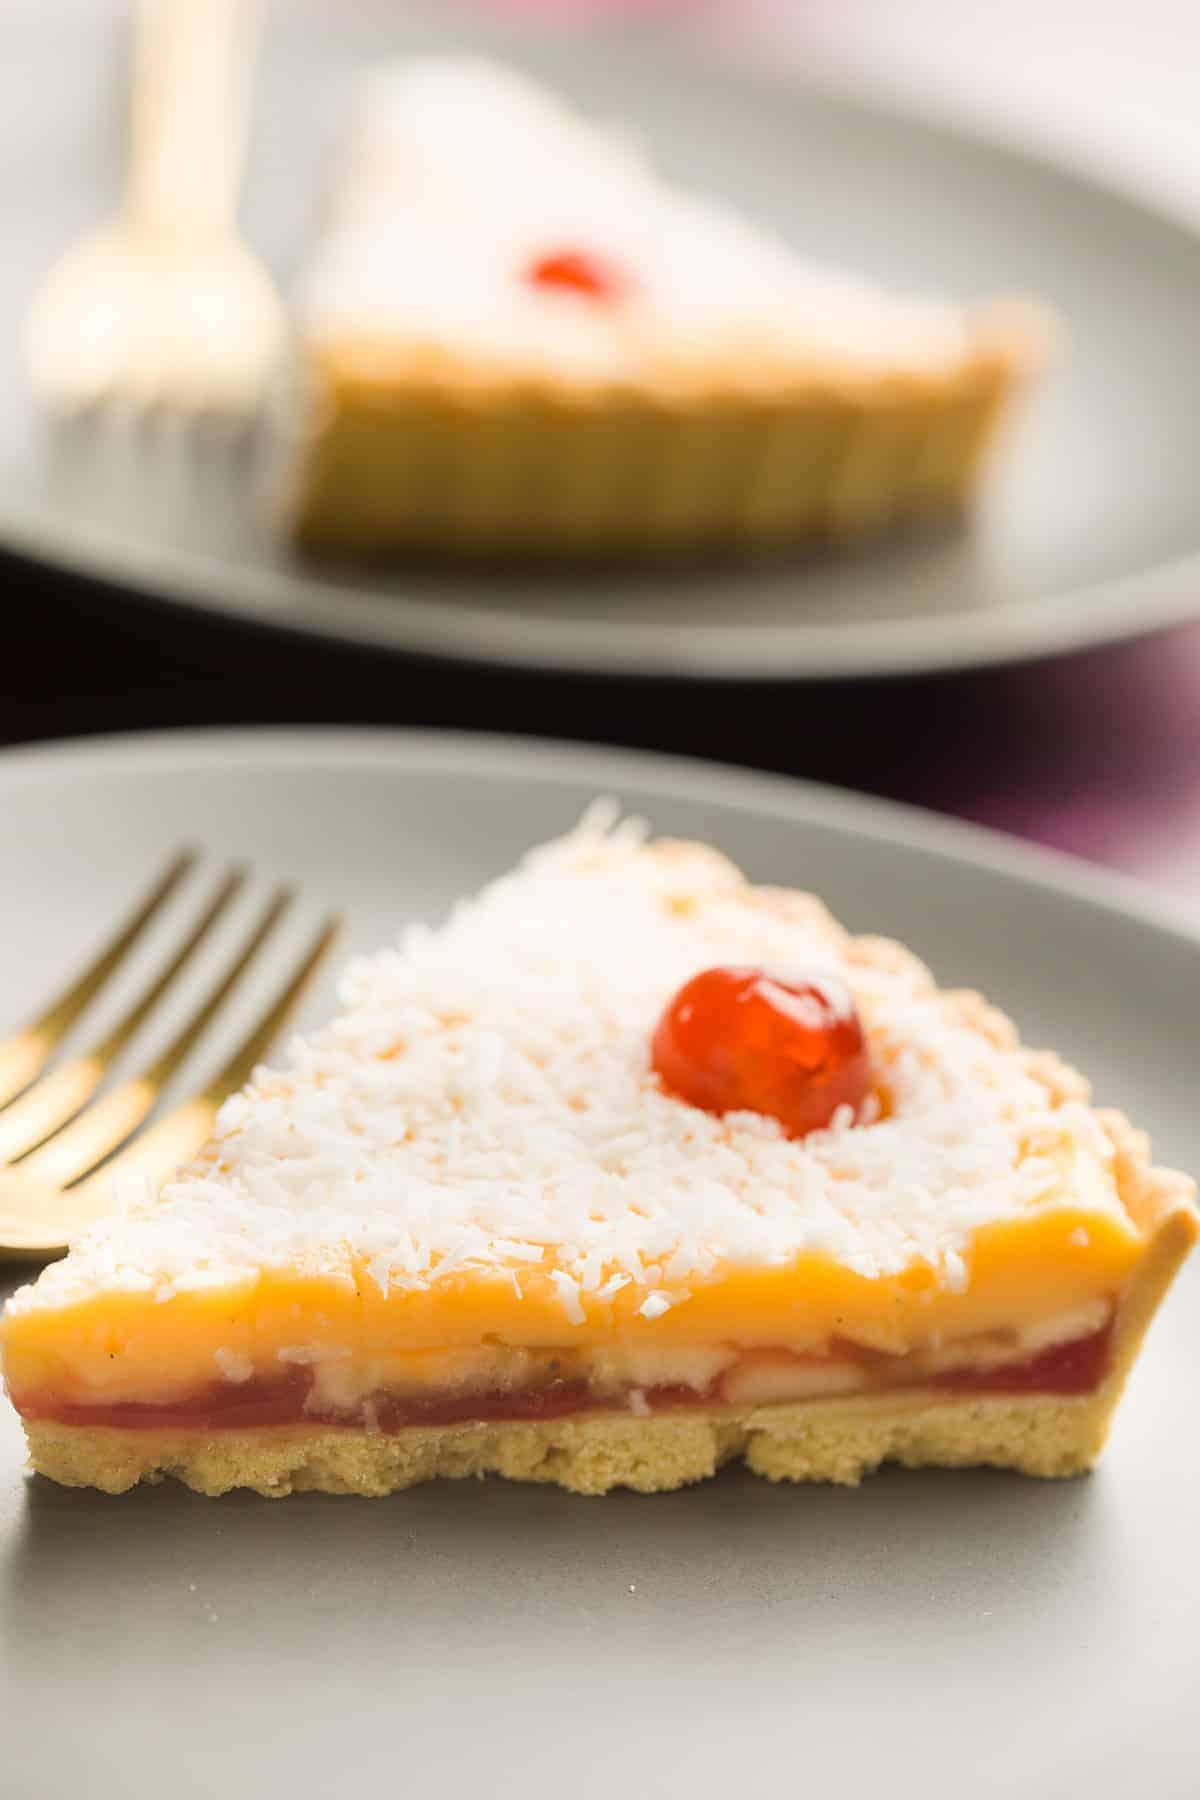 A slice of jam and custard tart.